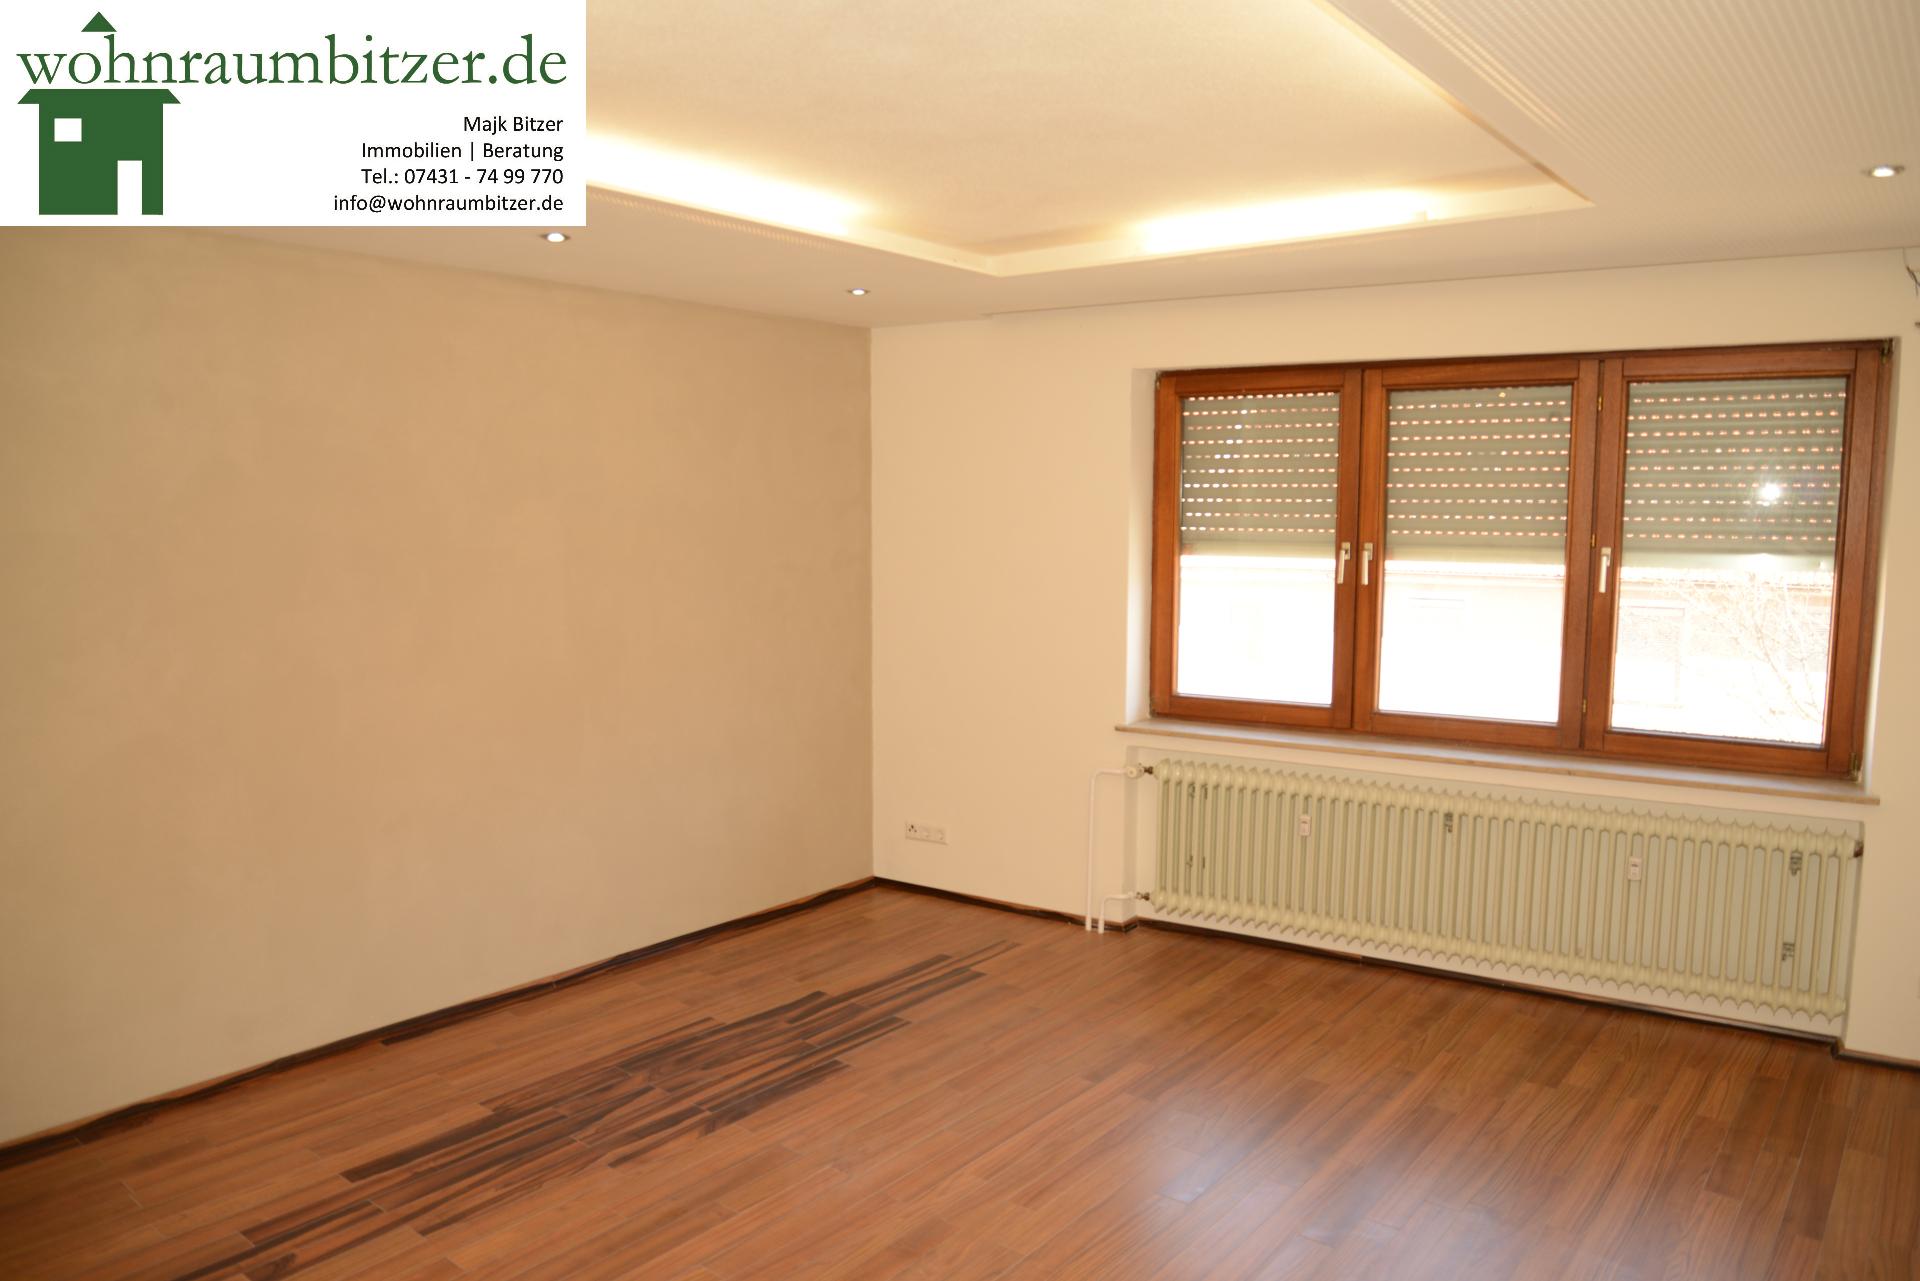 3 zimmer wohnung albstadt tailfingen. Black Bedroom Furniture Sets. Home Design Ideas